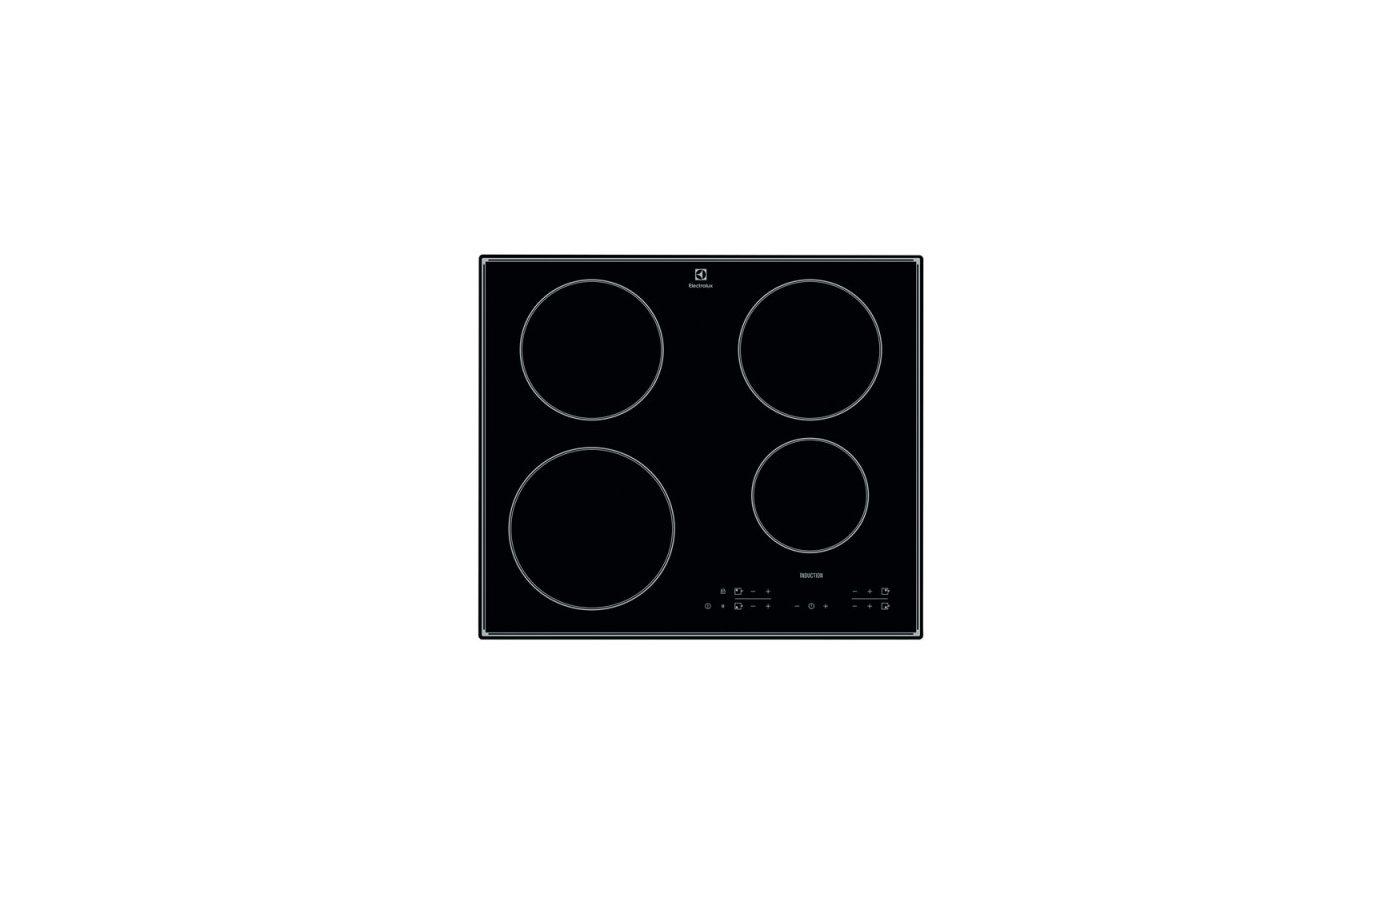 Варочная панель ELECTROLUX IPE 644 RCC